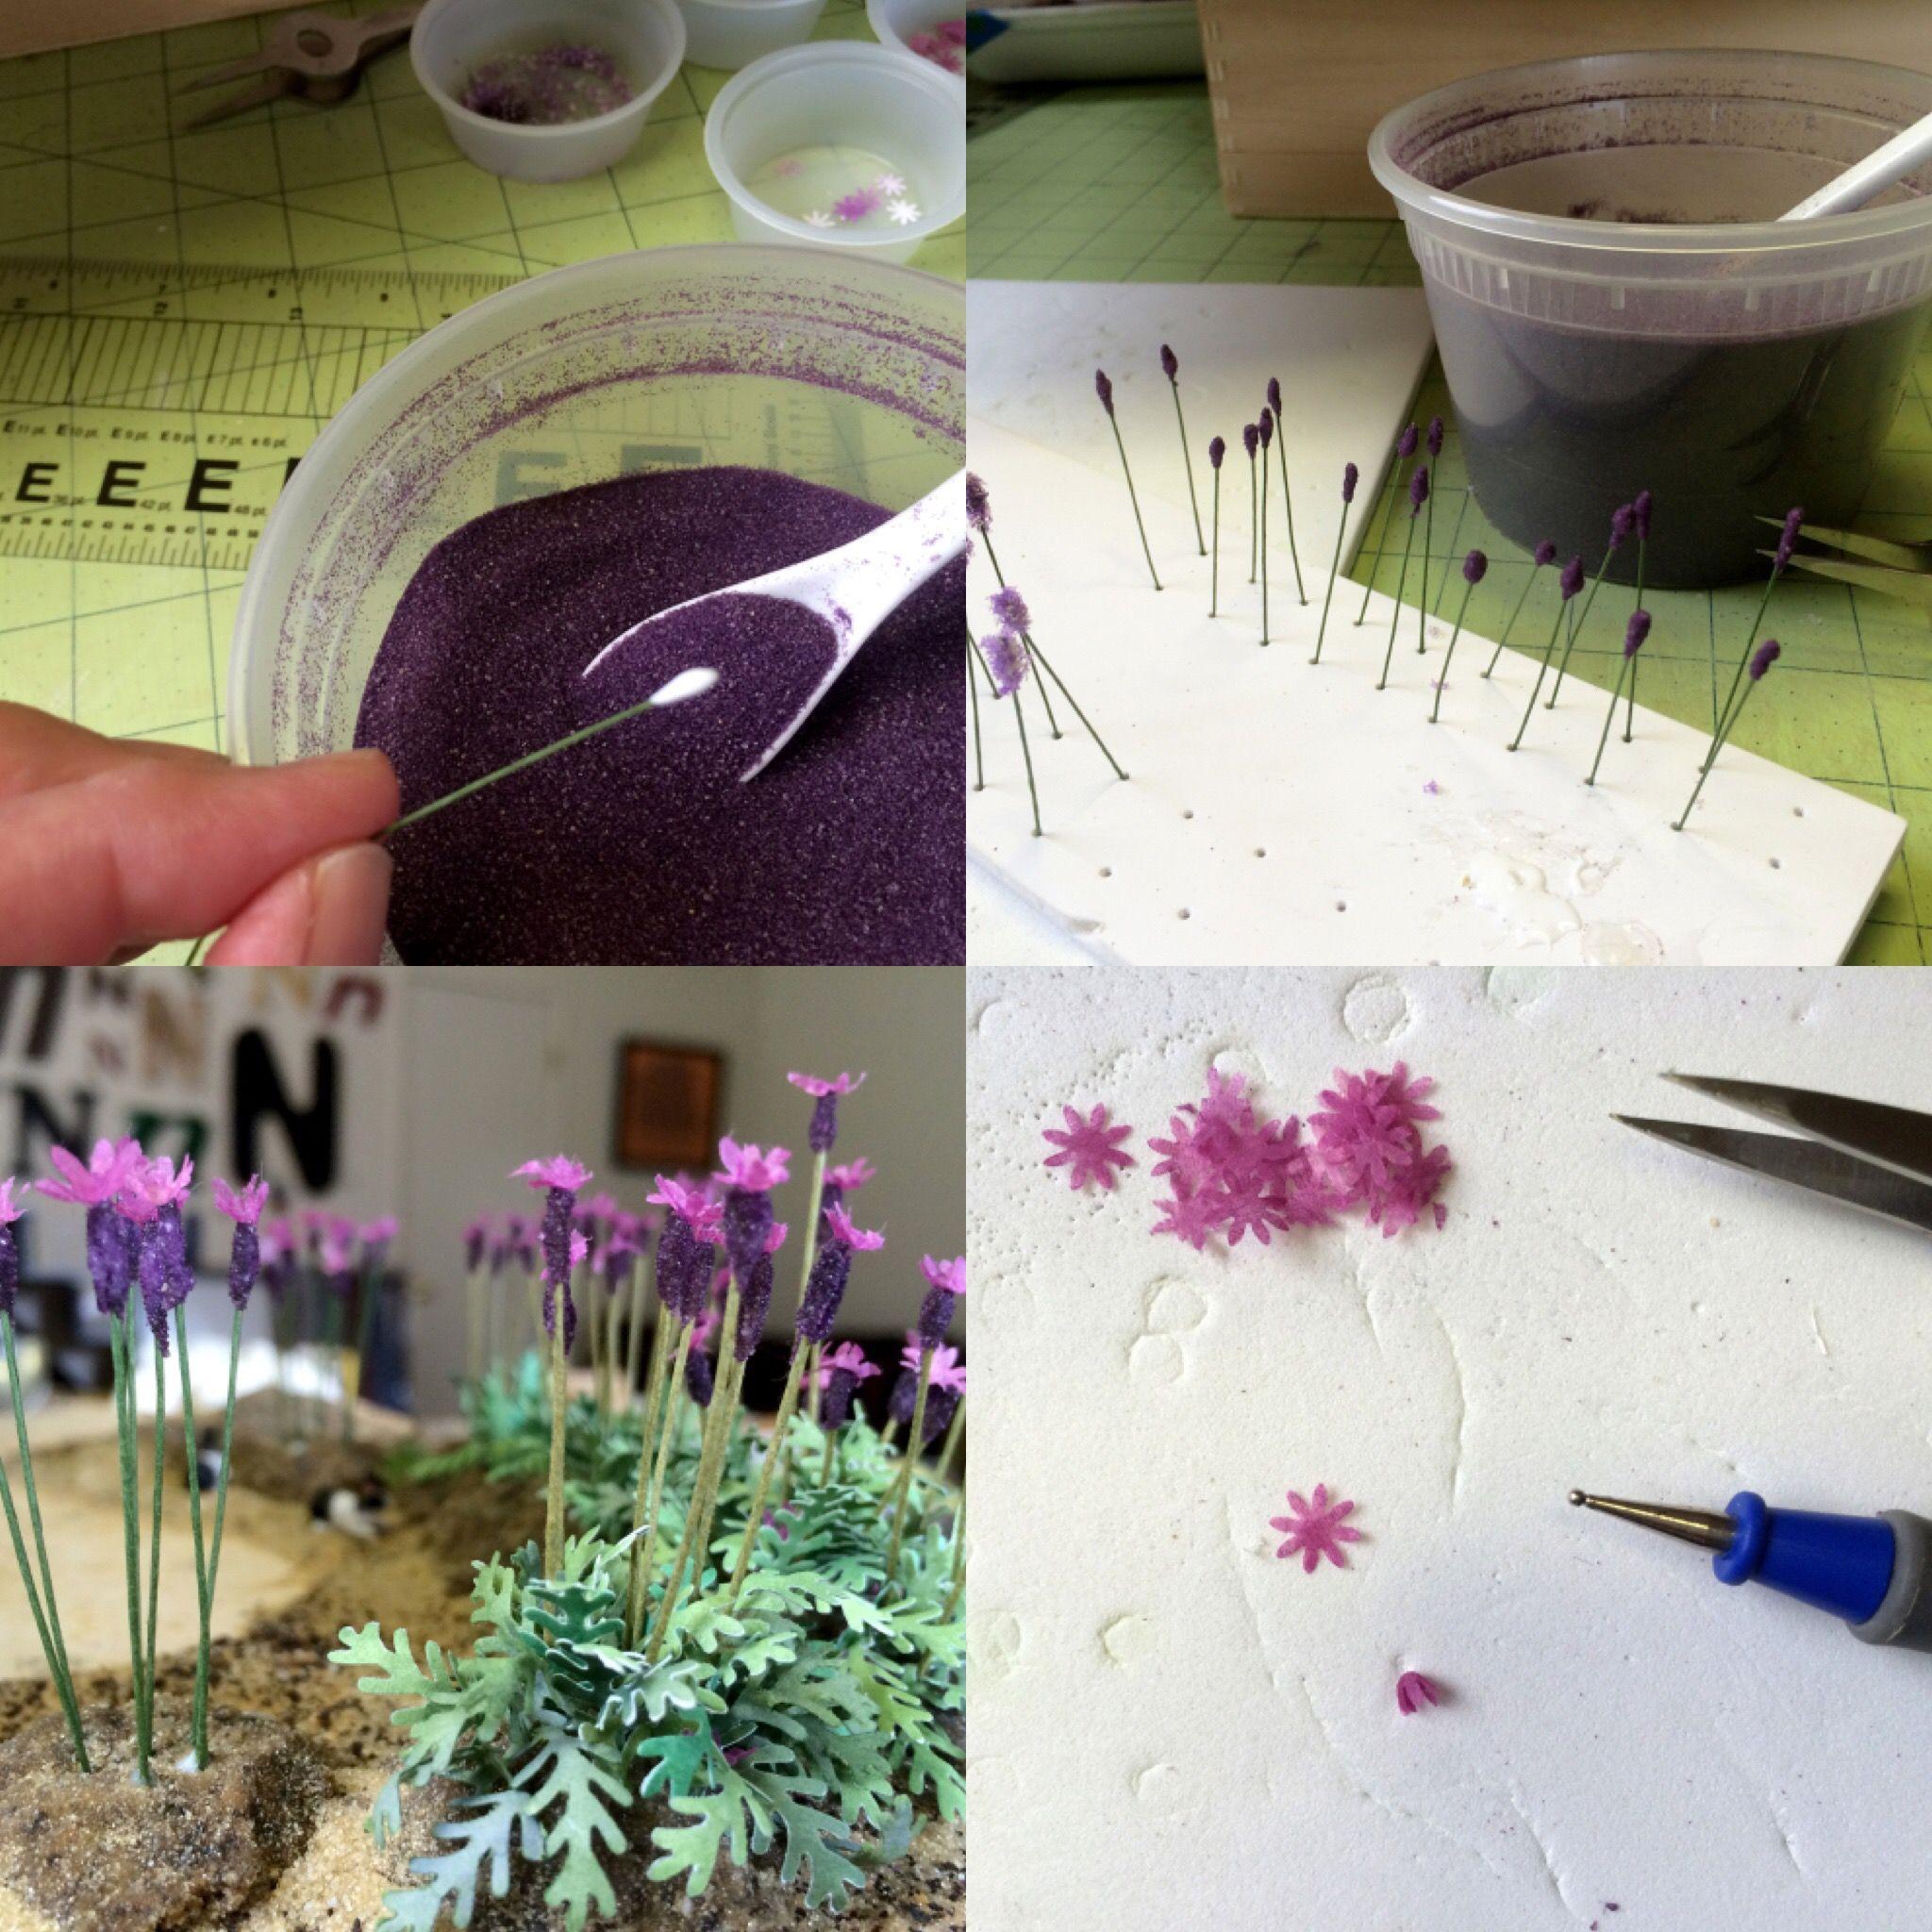 Dollhouse Miniatures Diy Tutorials: How To Make Miniature Lavender By Nancy Enge Design